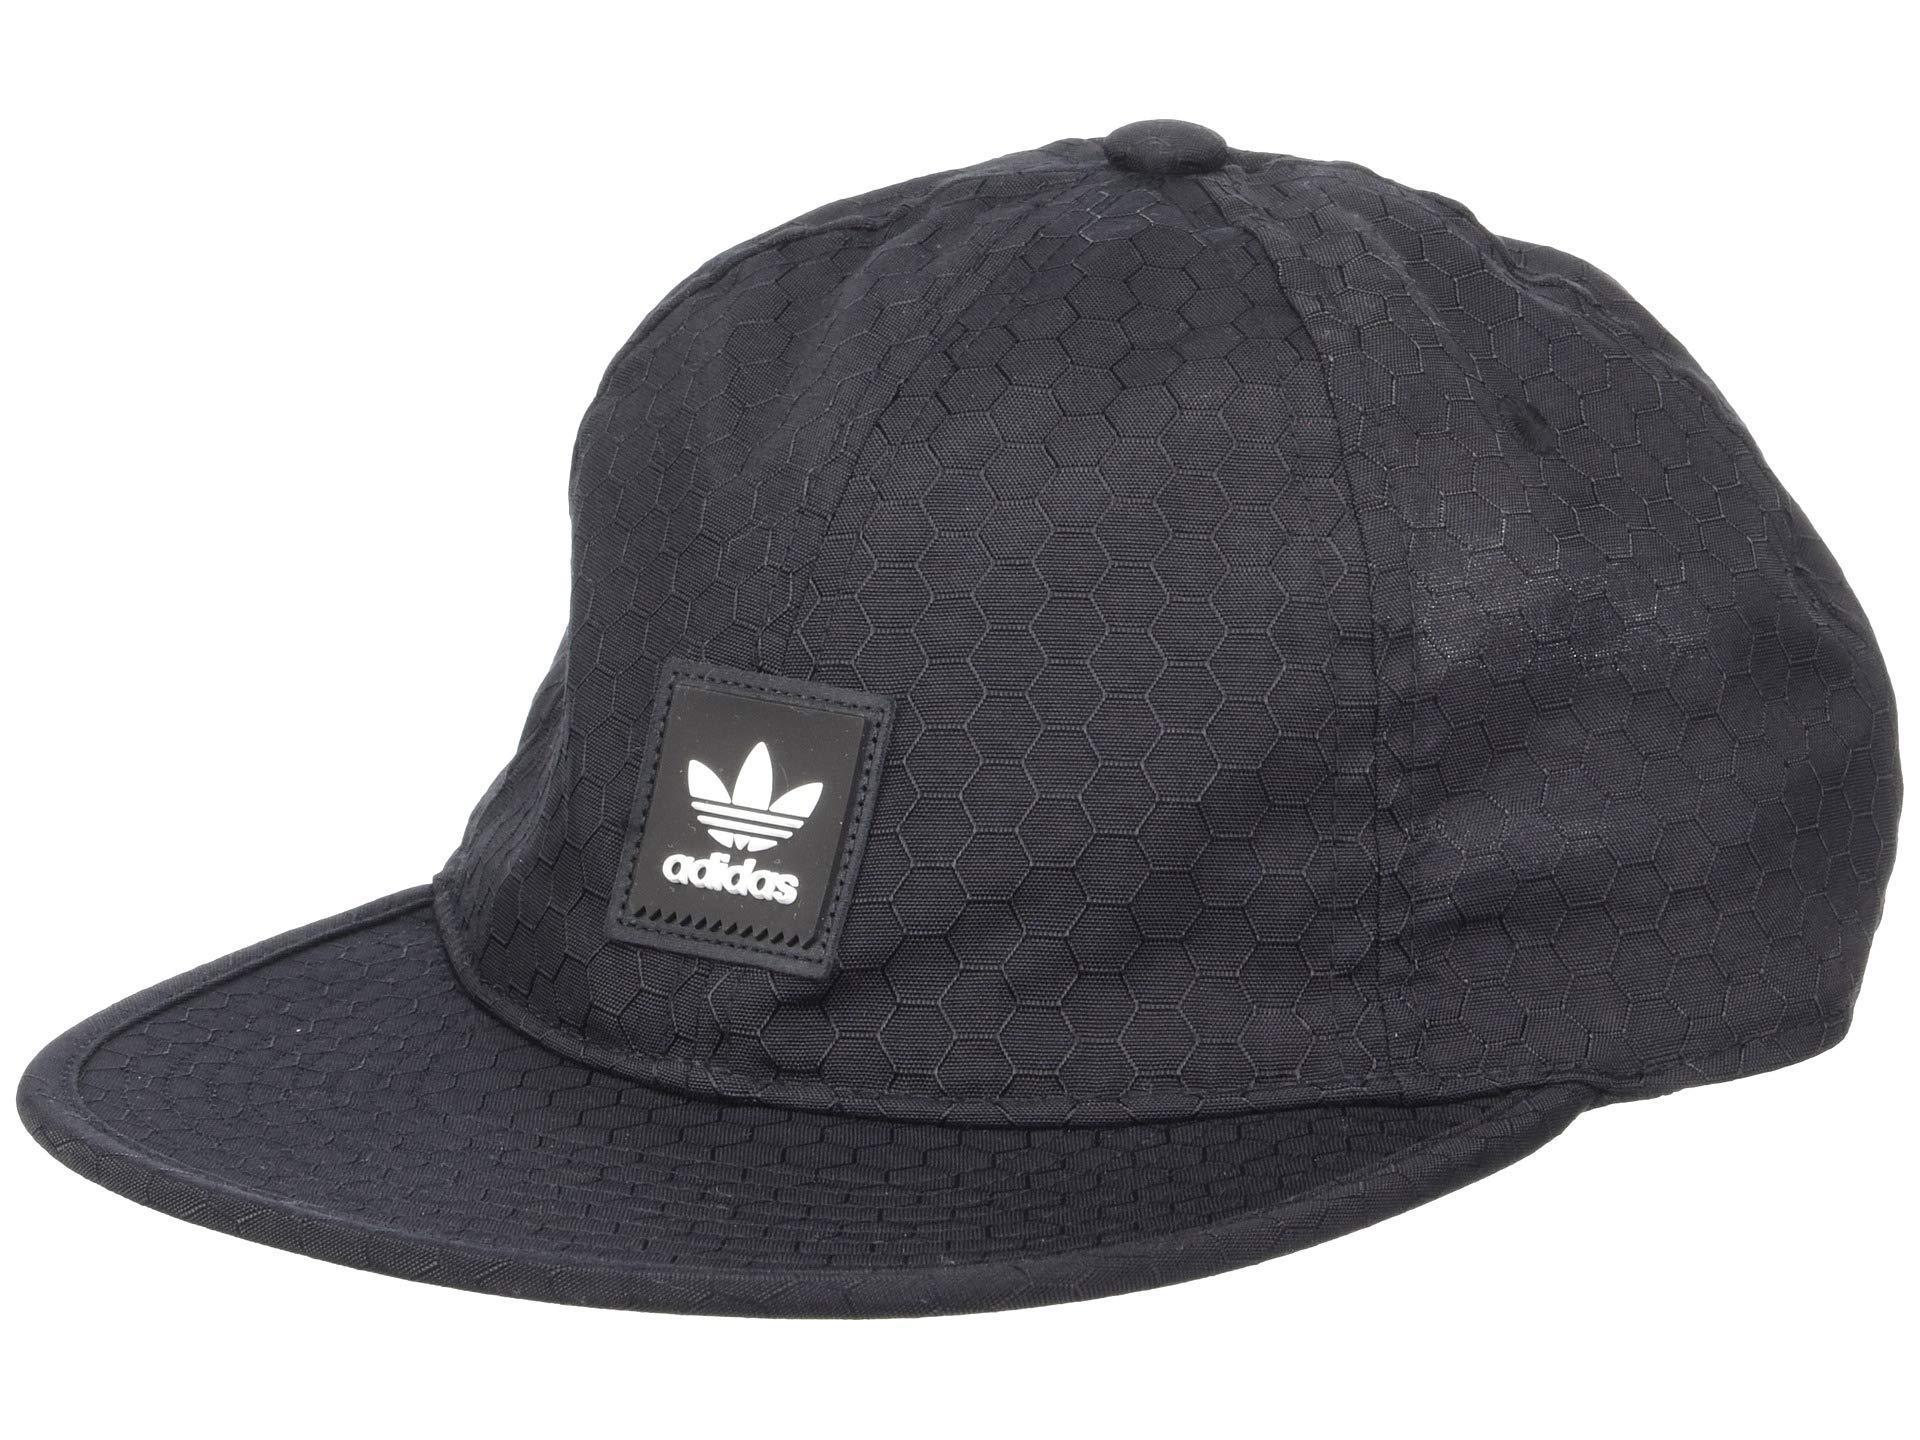 1215ae1d0a9 Lyst - adidas Originals Insley Crusher Hat (dark Grey Heather Solid ...